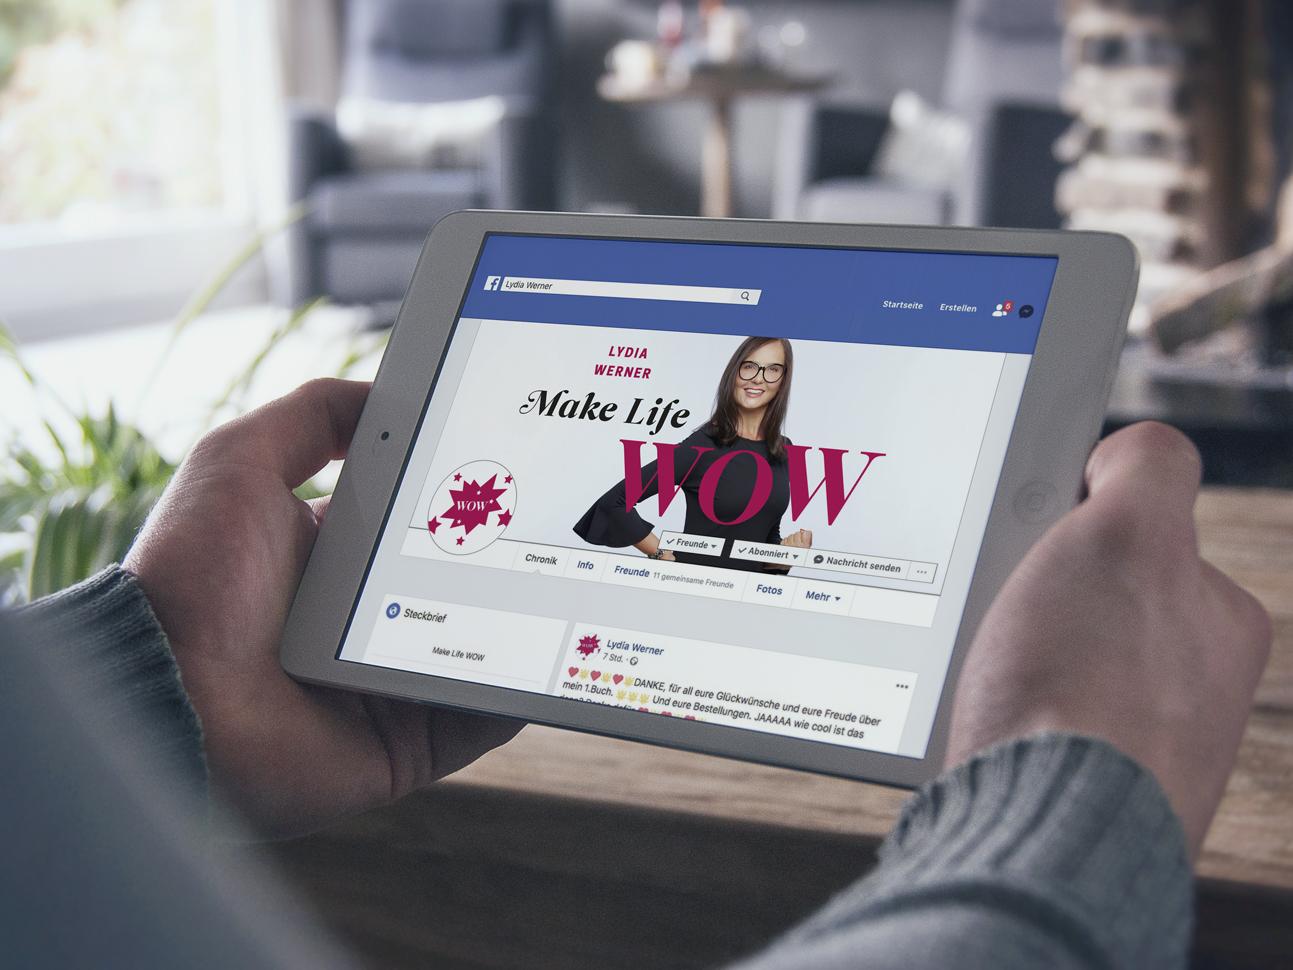 martin zech design, facebook-header, self publishing, lydia werner, make life wow